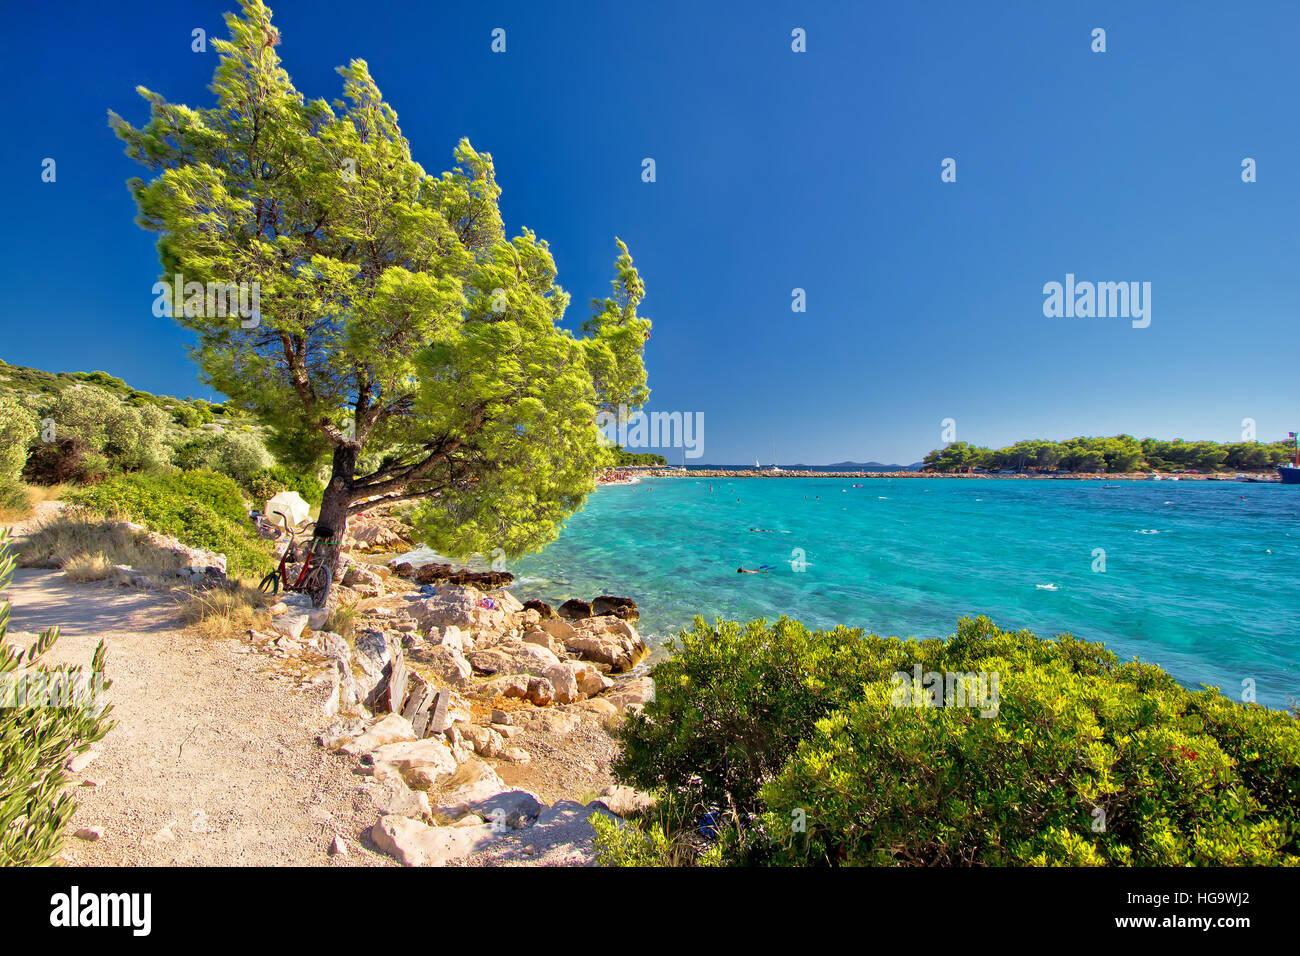 Idyllic turquoise beach in Croatia, Island of Murter, Dalmatia region - Stock Image